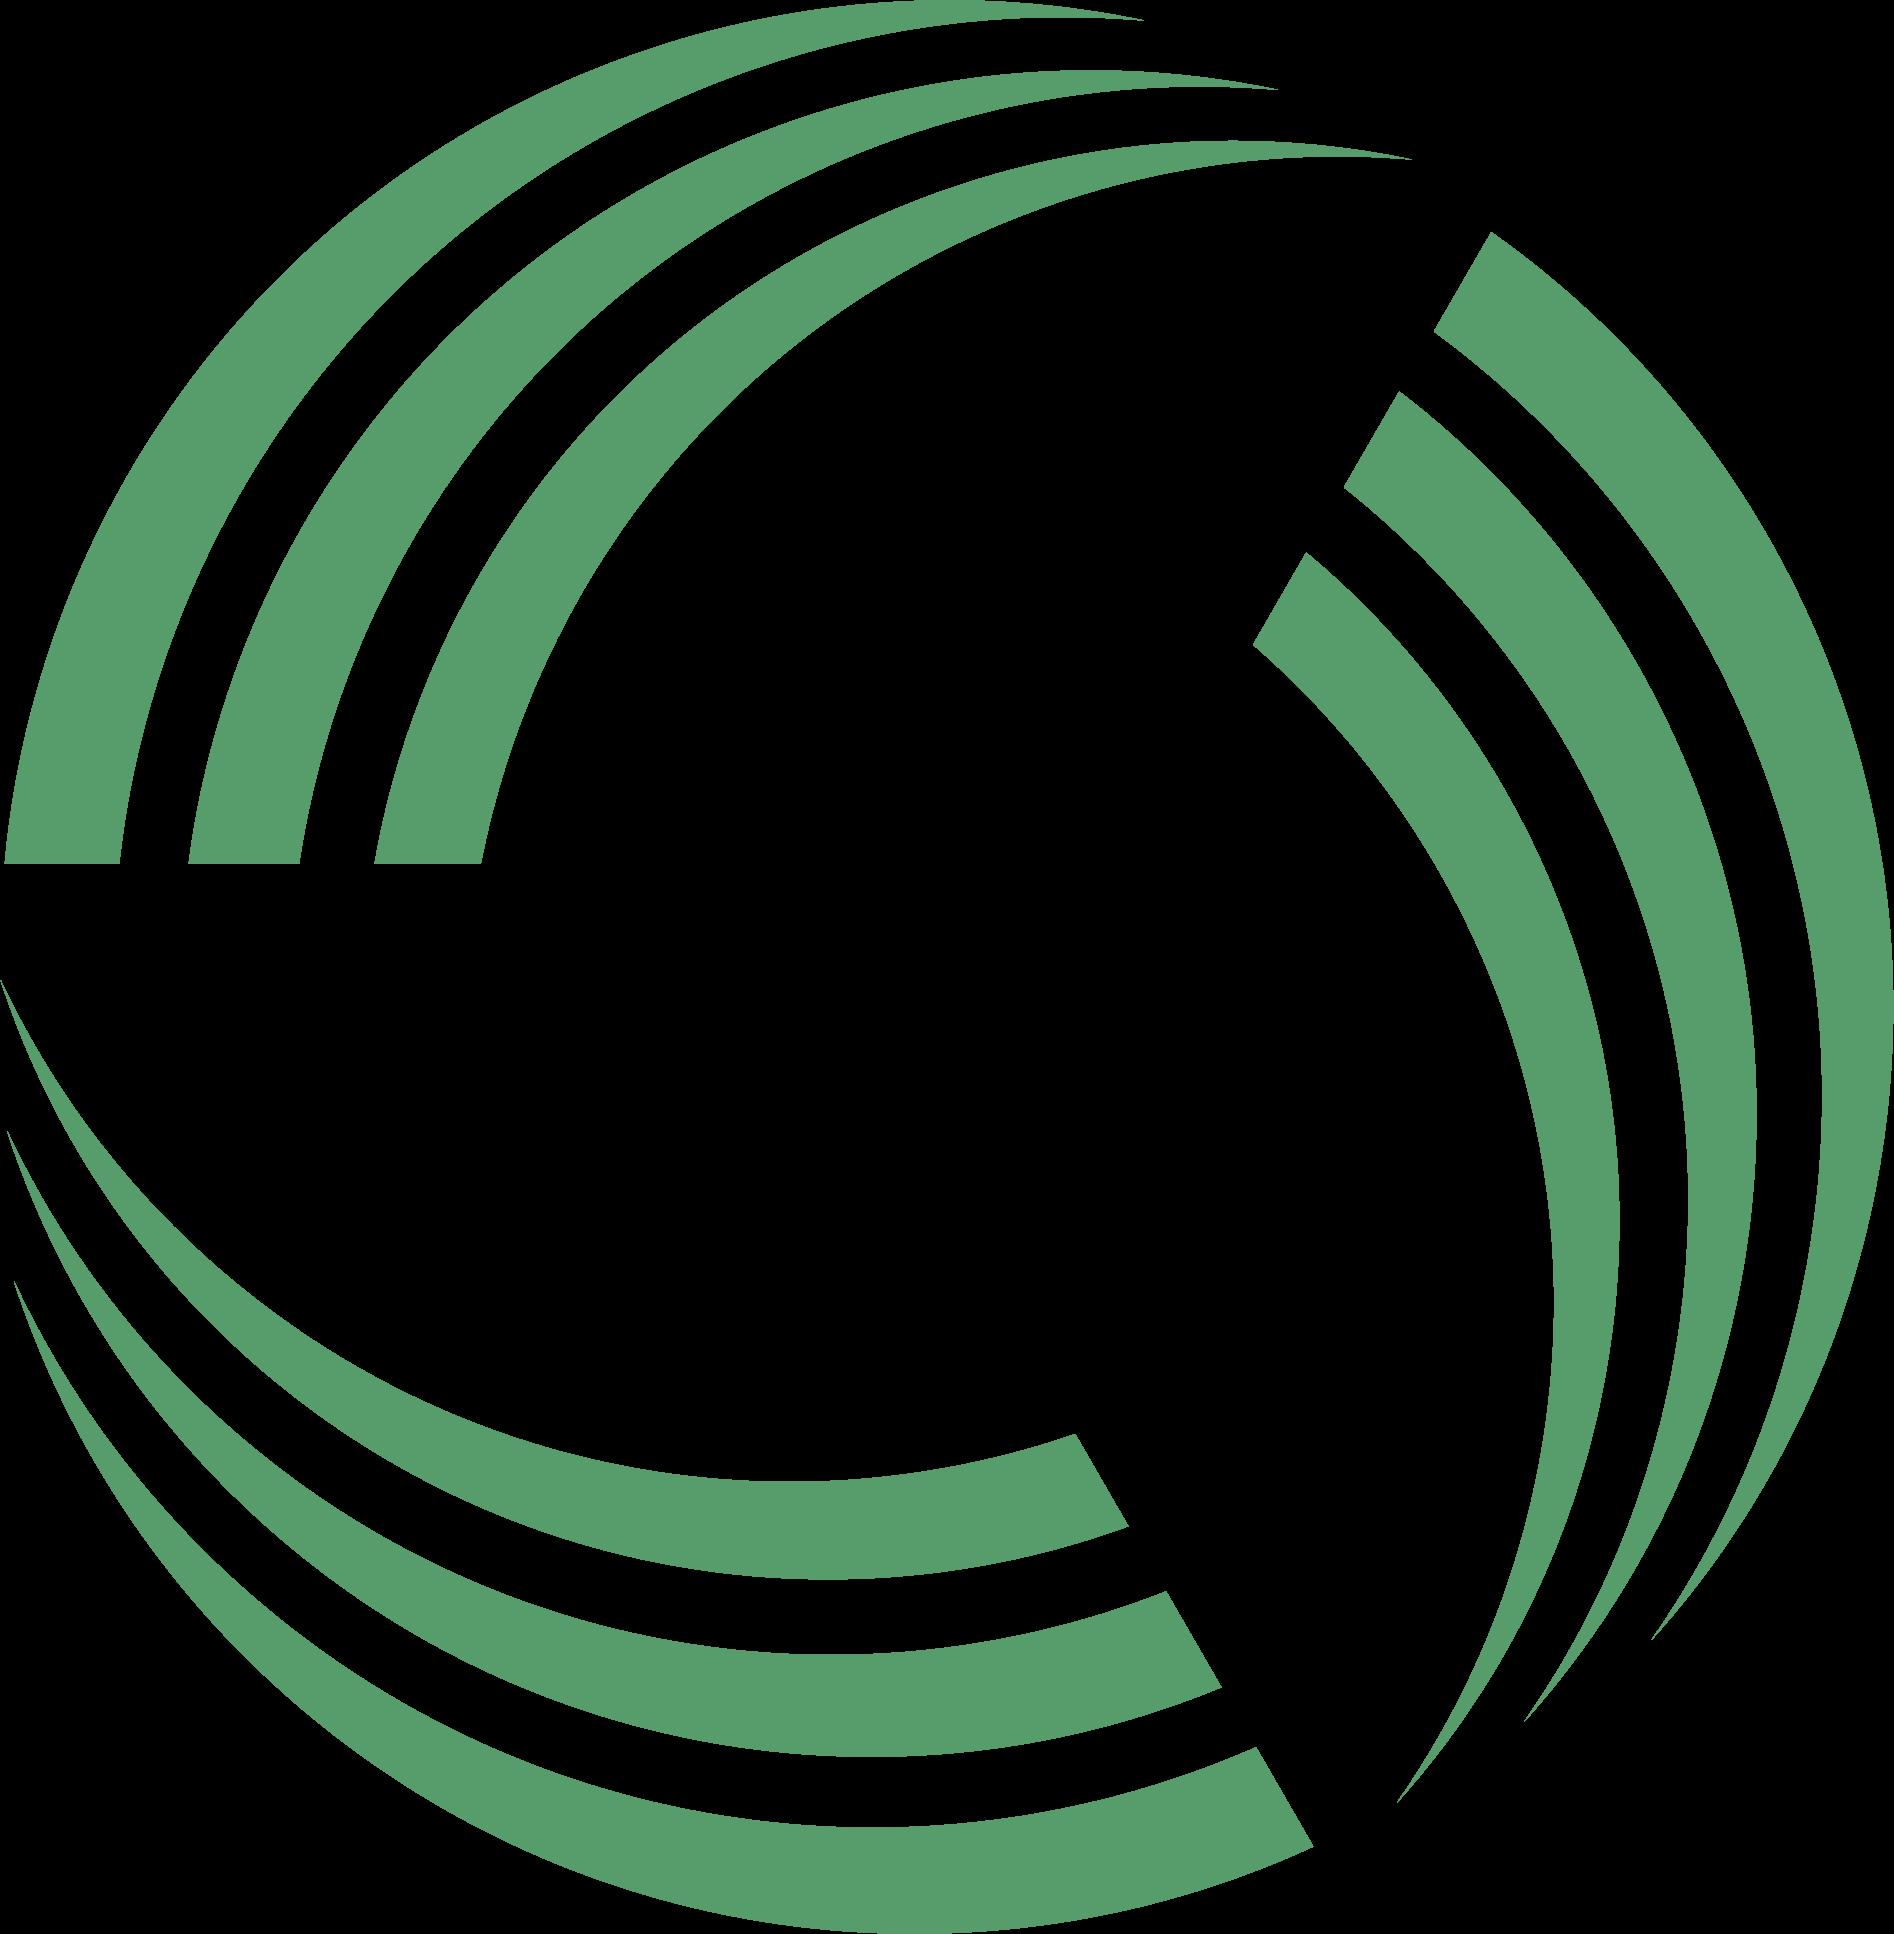 Logo tennisbal